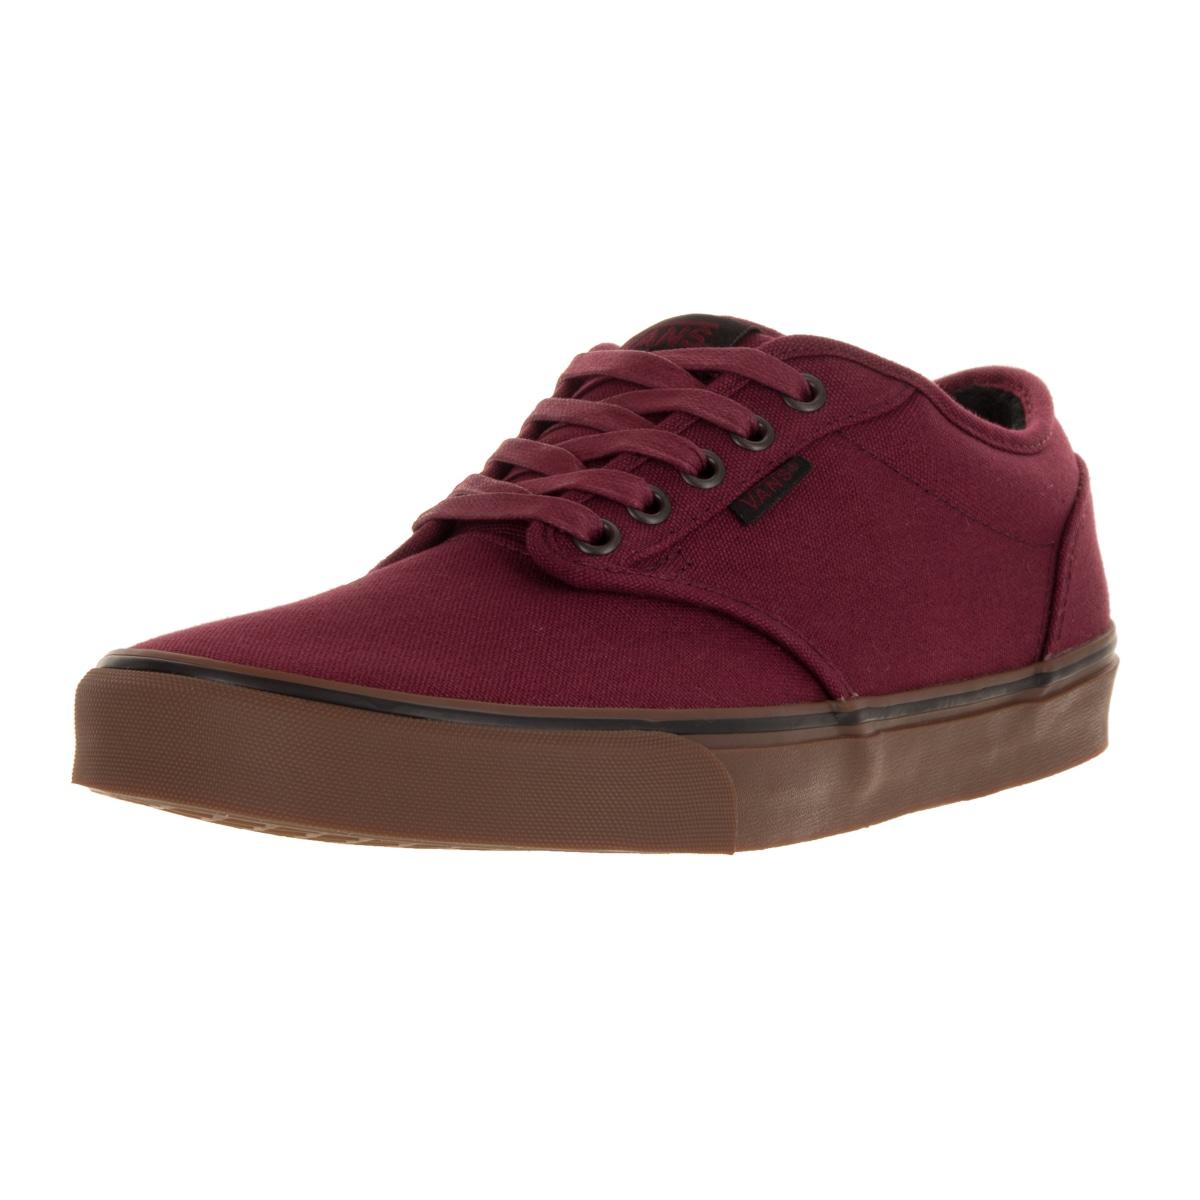 Vans Men's Atwood Red Cordovan Skate Shoe (8) (canvas)